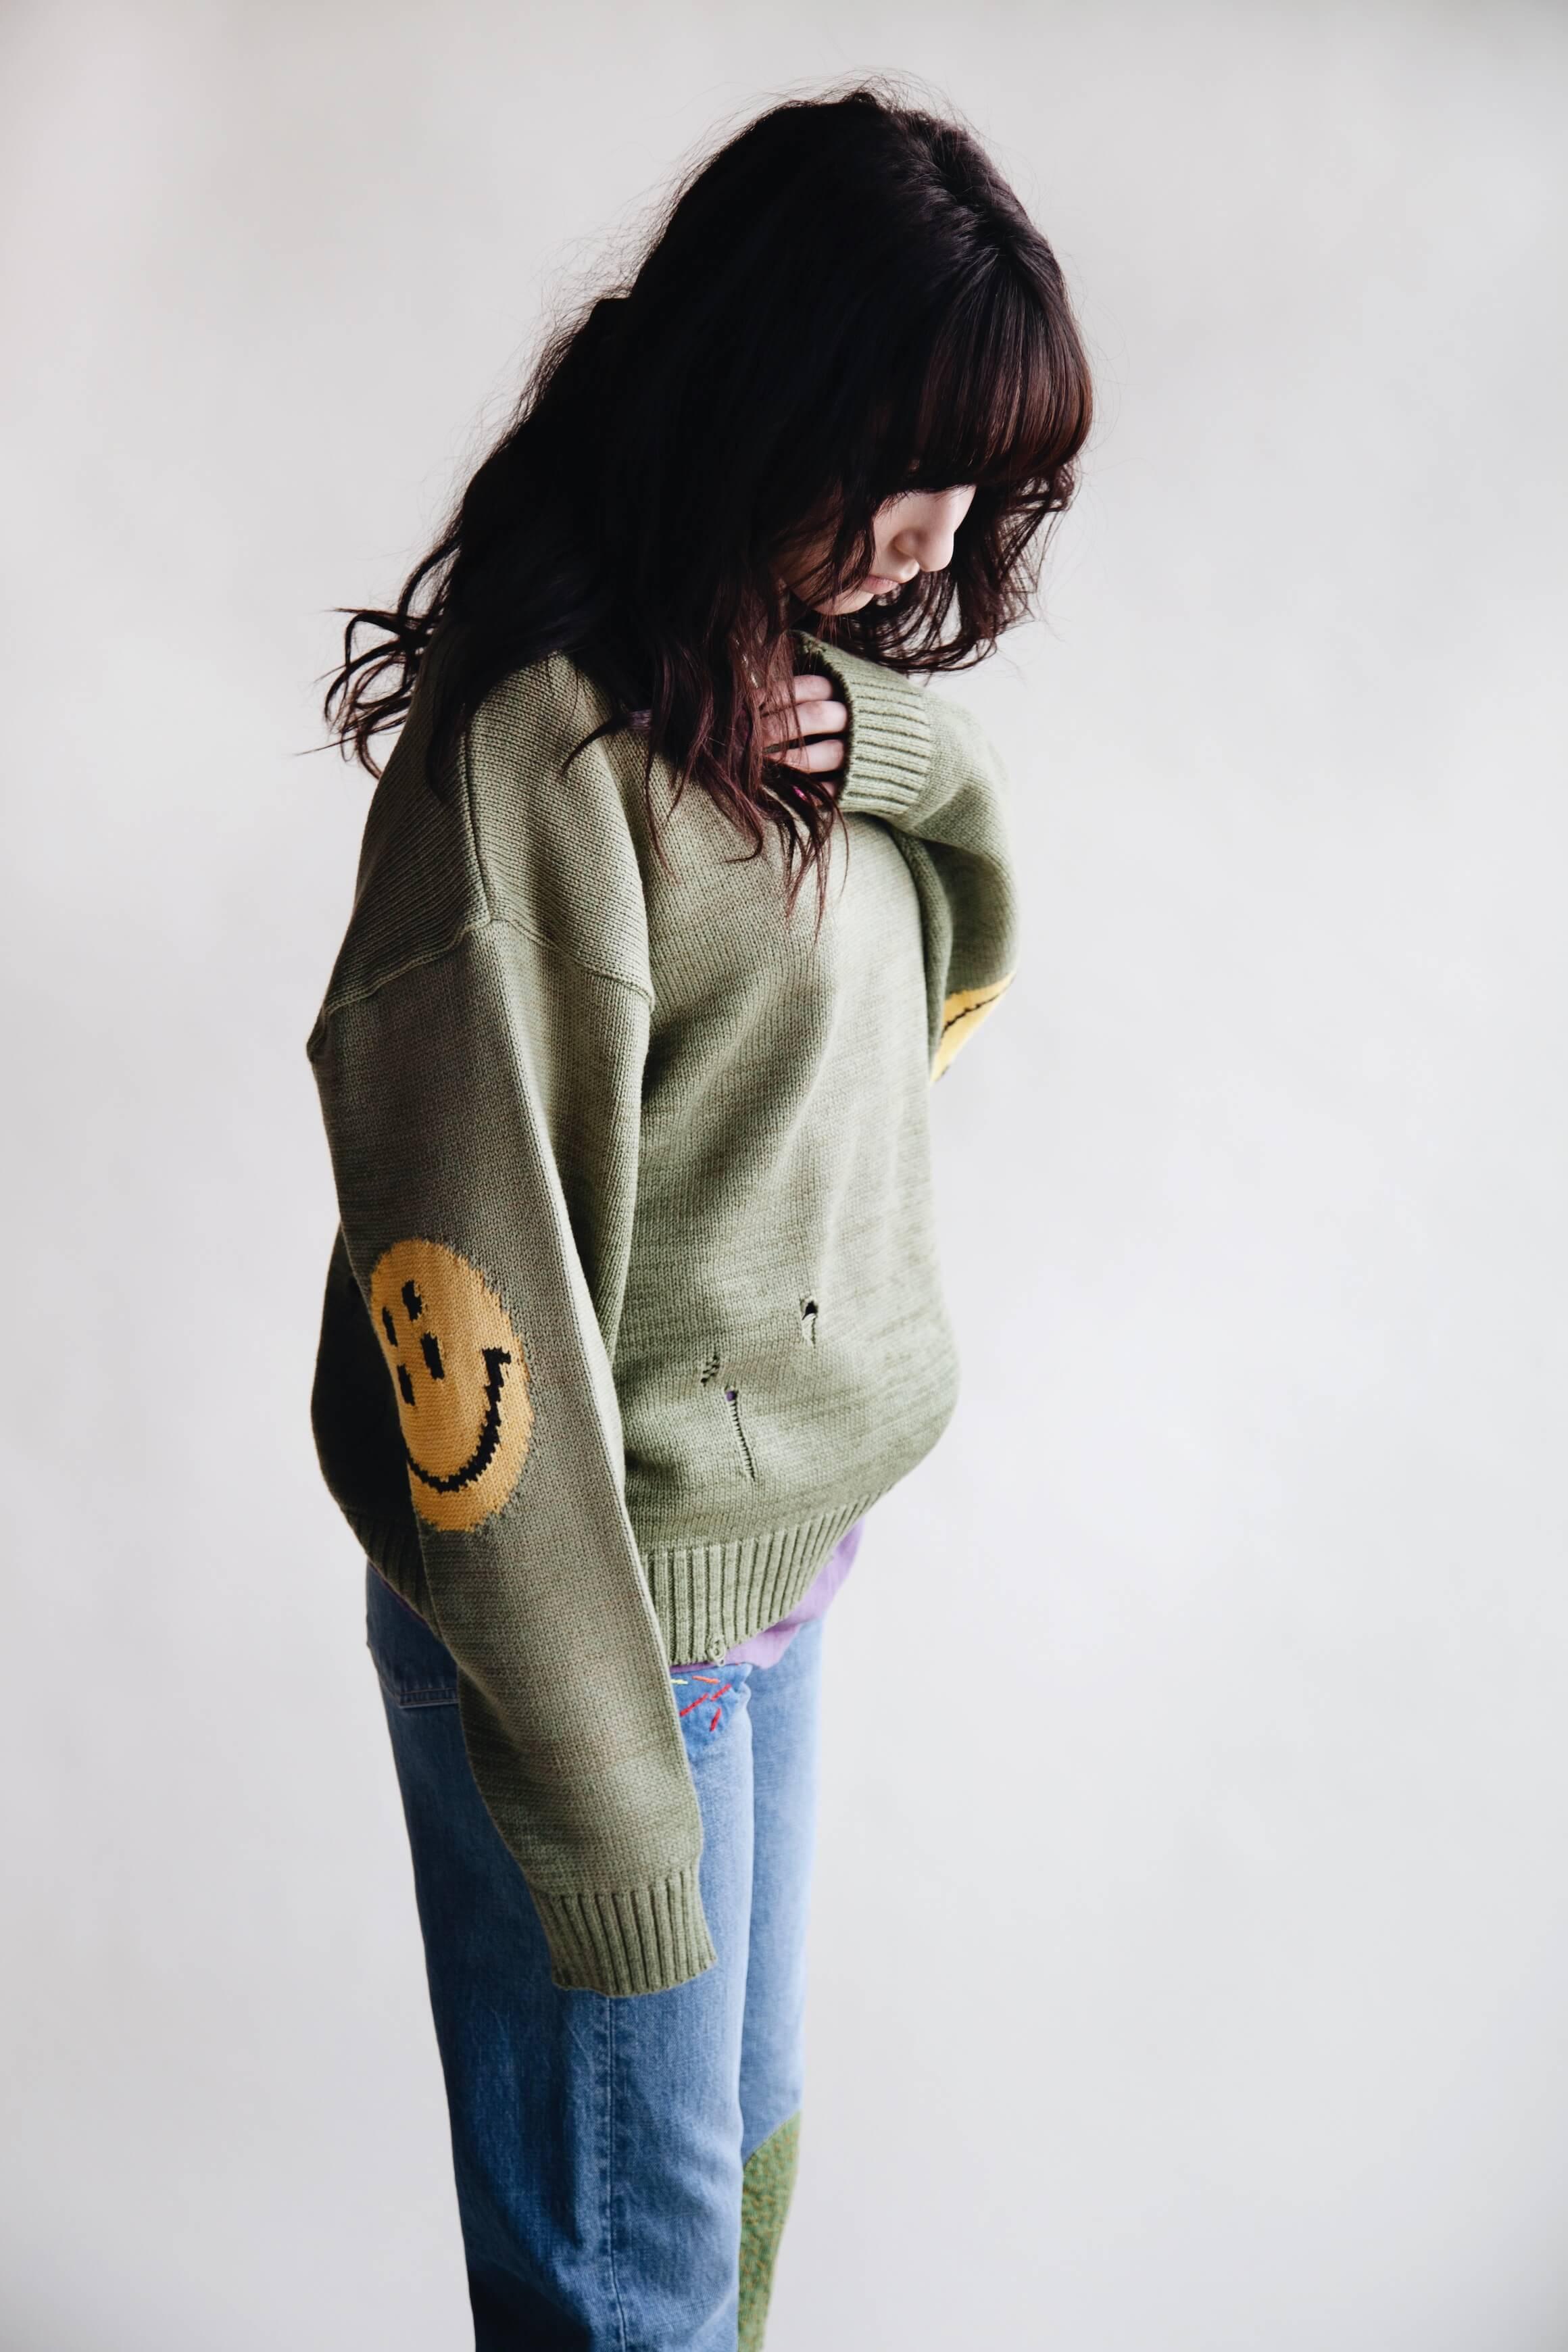 Kapital clothing japan 5g cotton knit smilie patch crew sweater, gauze jersey crew pocket tee, 14oz denim 5p monkey cisco jeans on body